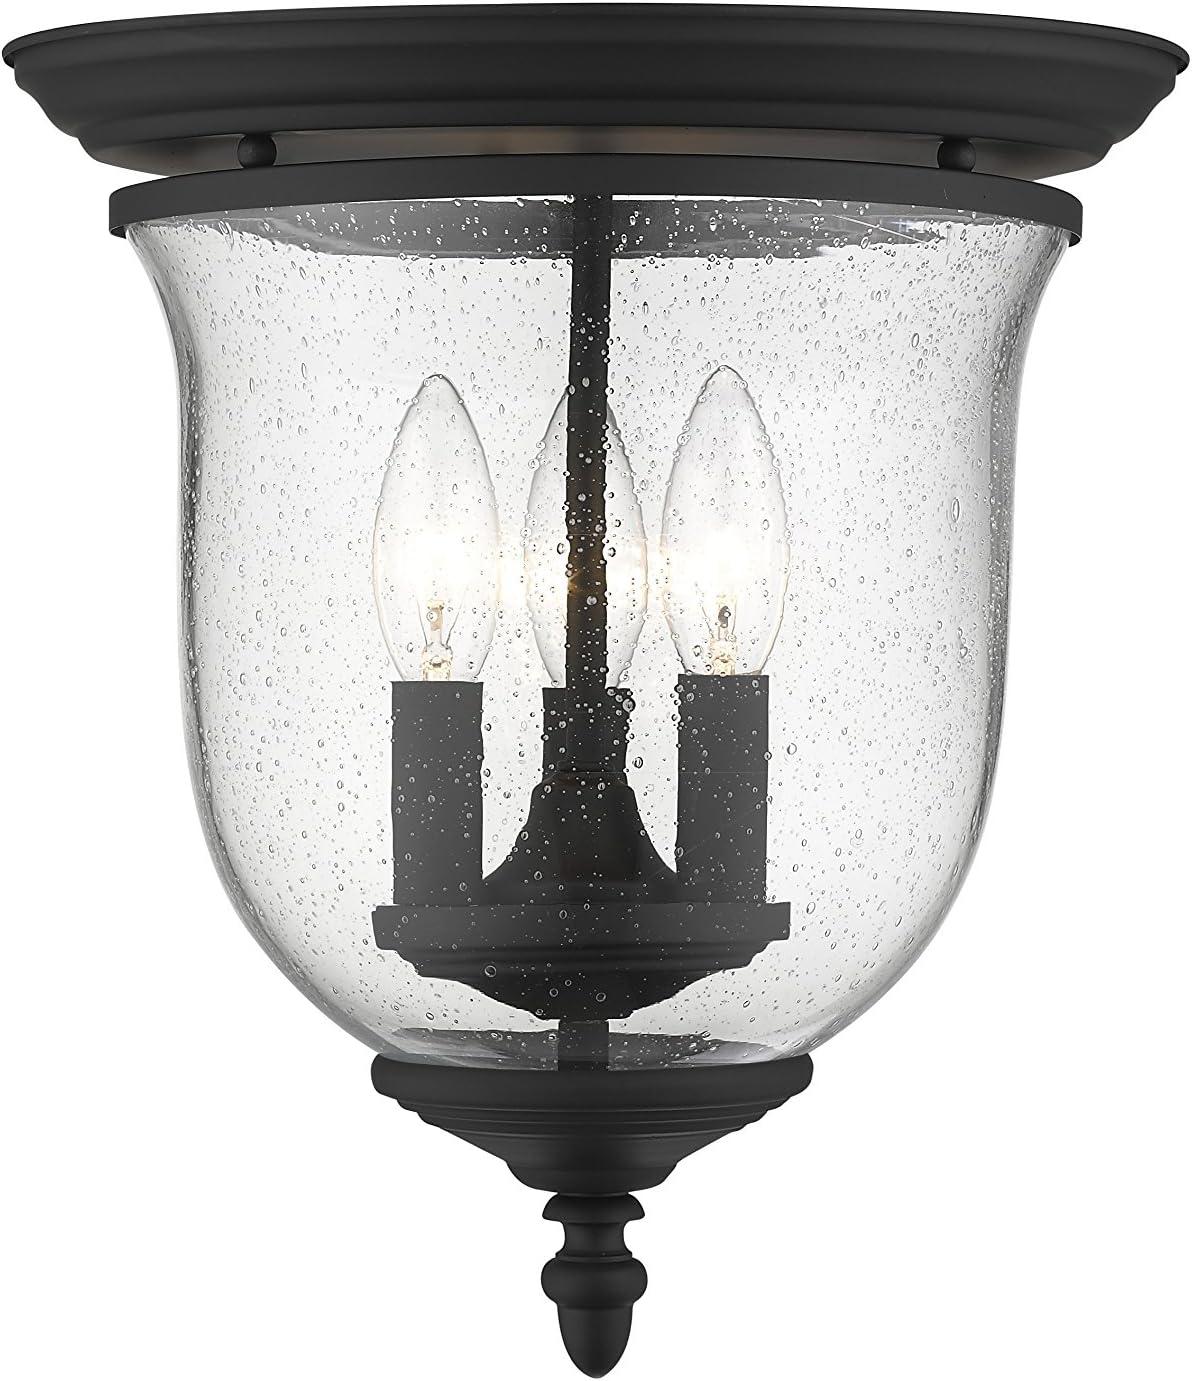 Livex Lighting 5024-04 Legacy 3-Light Ceiling Mount, Black